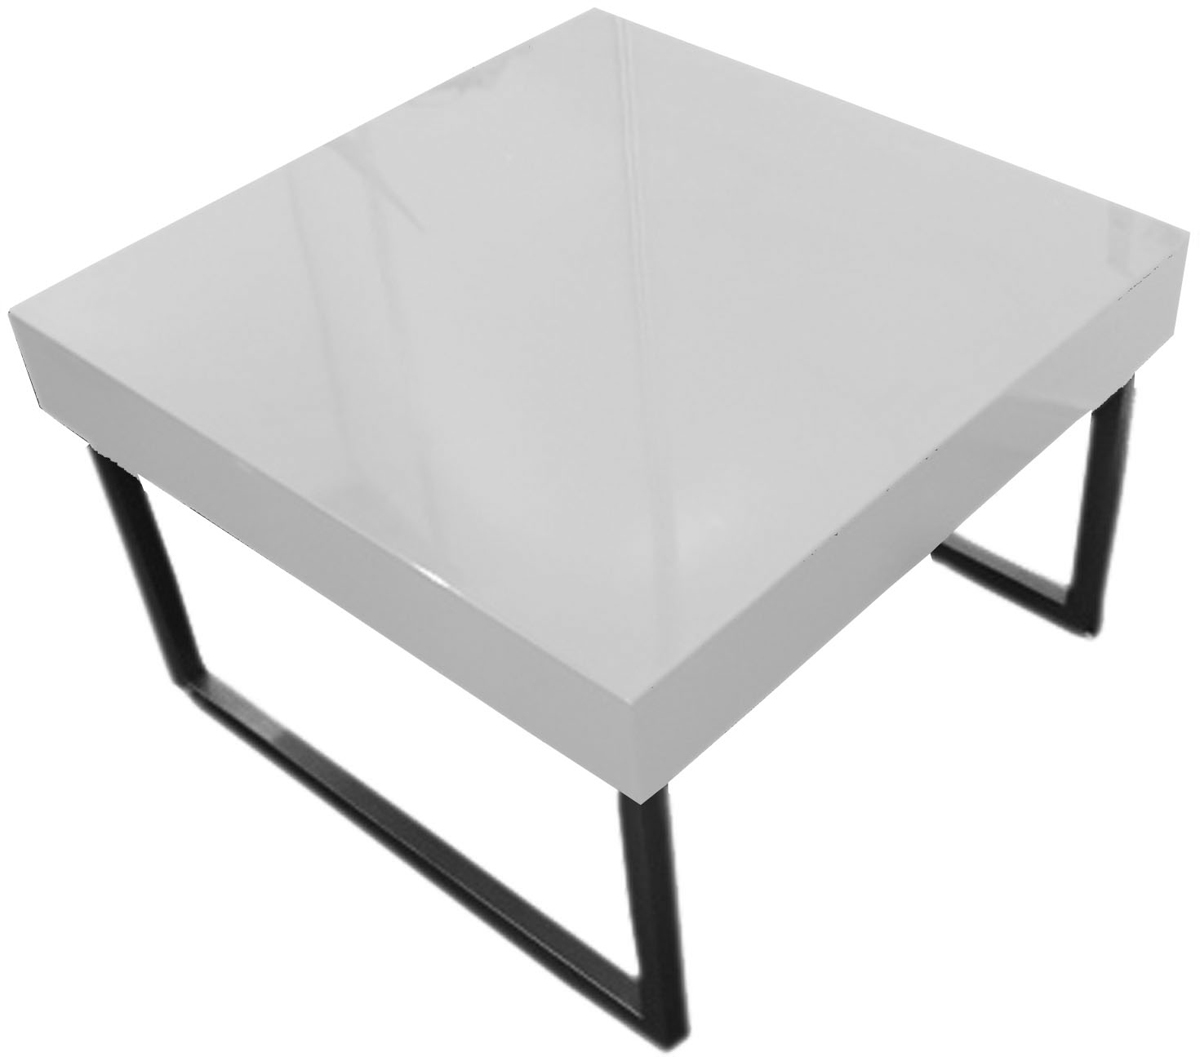 table basse design blanche laqu e carr e morgan miliboo. Black Bedroom Furniture Sets. Home Design Ideas